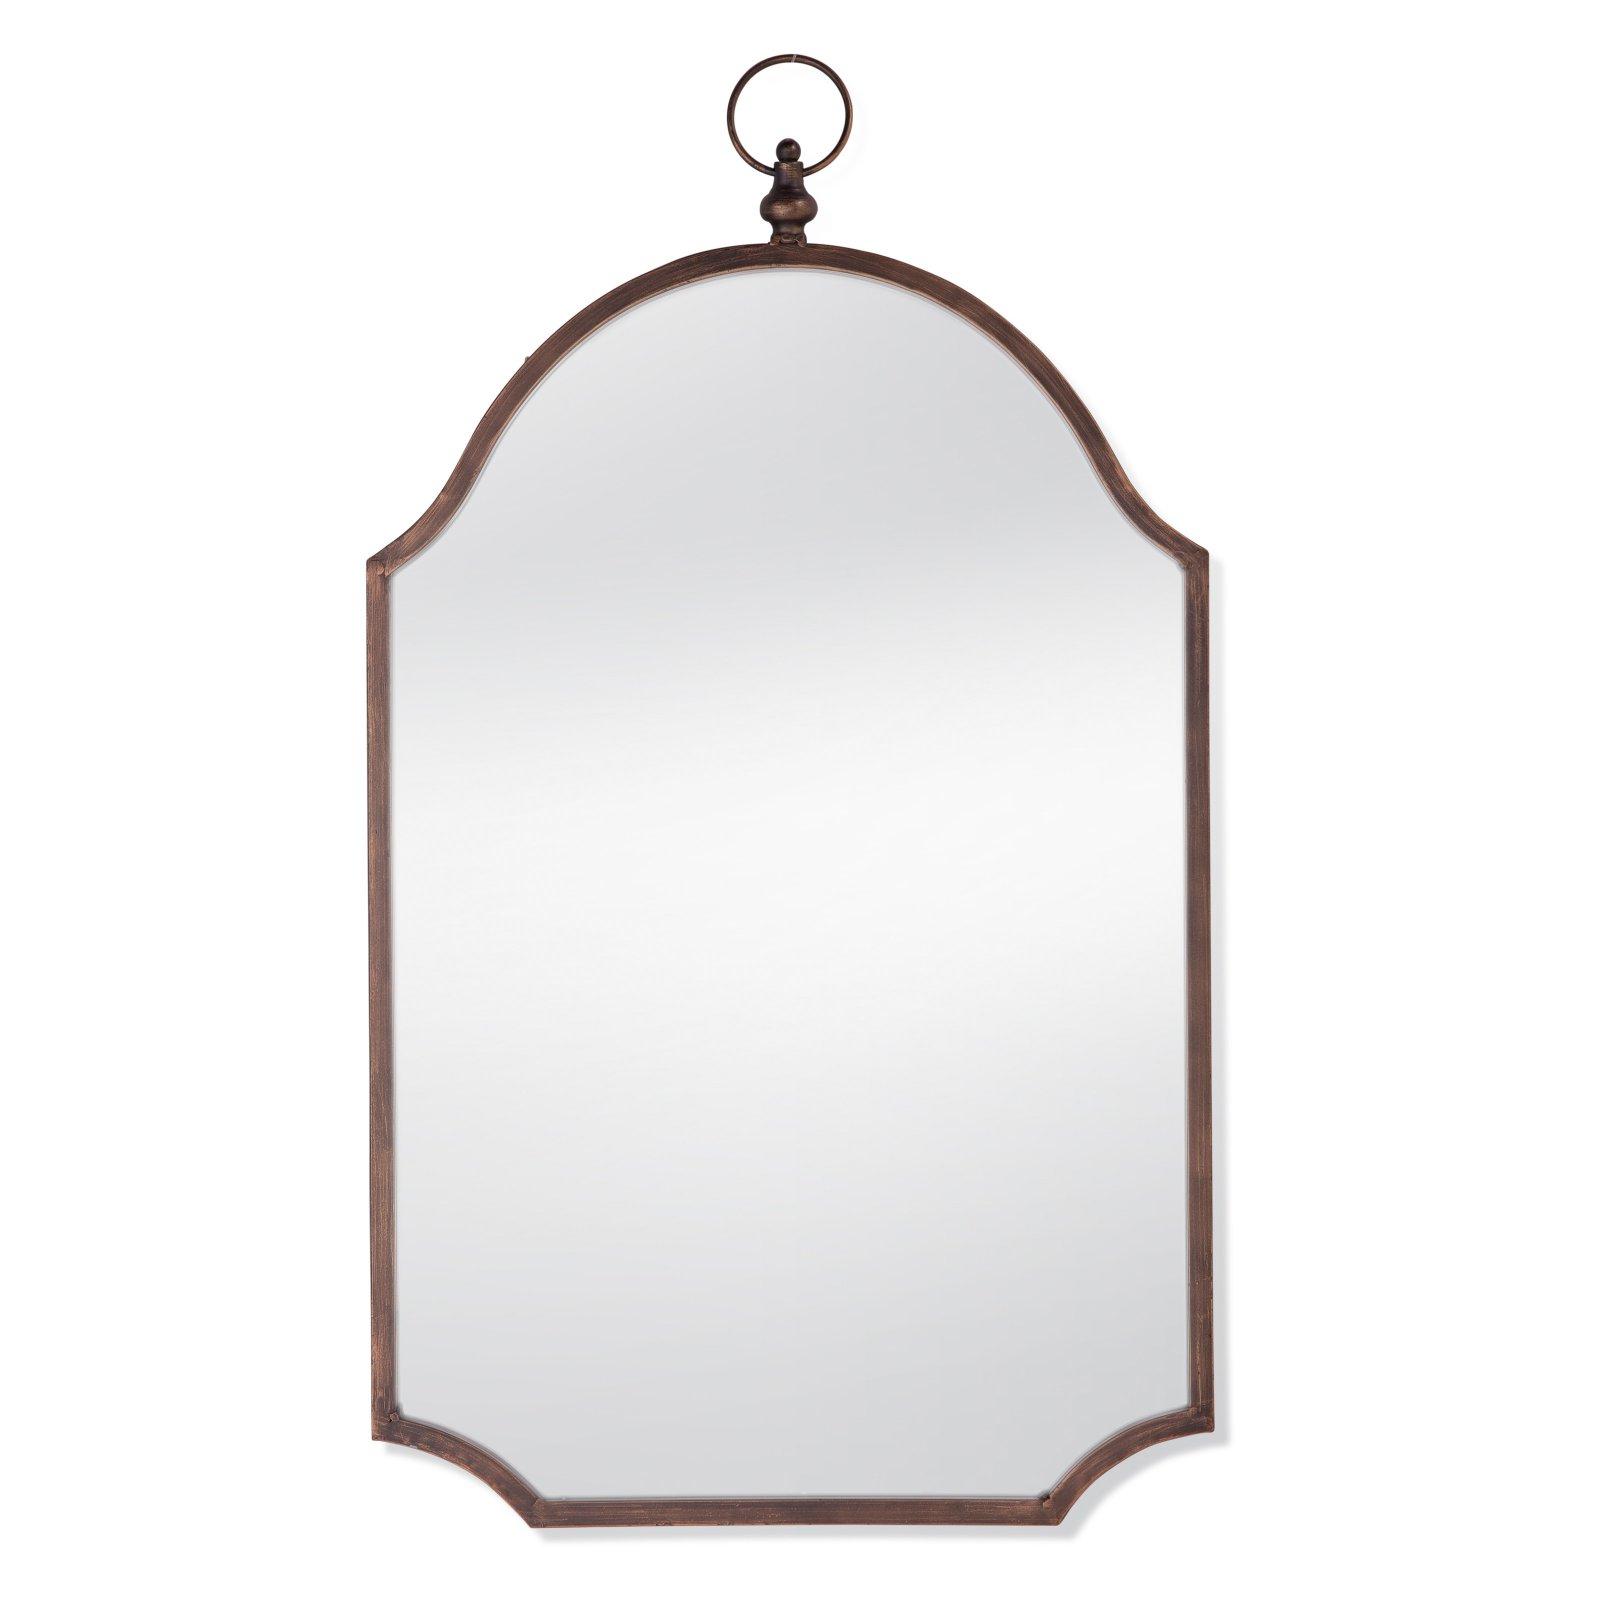 2020 Bassett Wall Mirrors Pertaining To Bassett Mirror Company Malina Wall Mirror – 20w X 34h In (View 16 of 20)